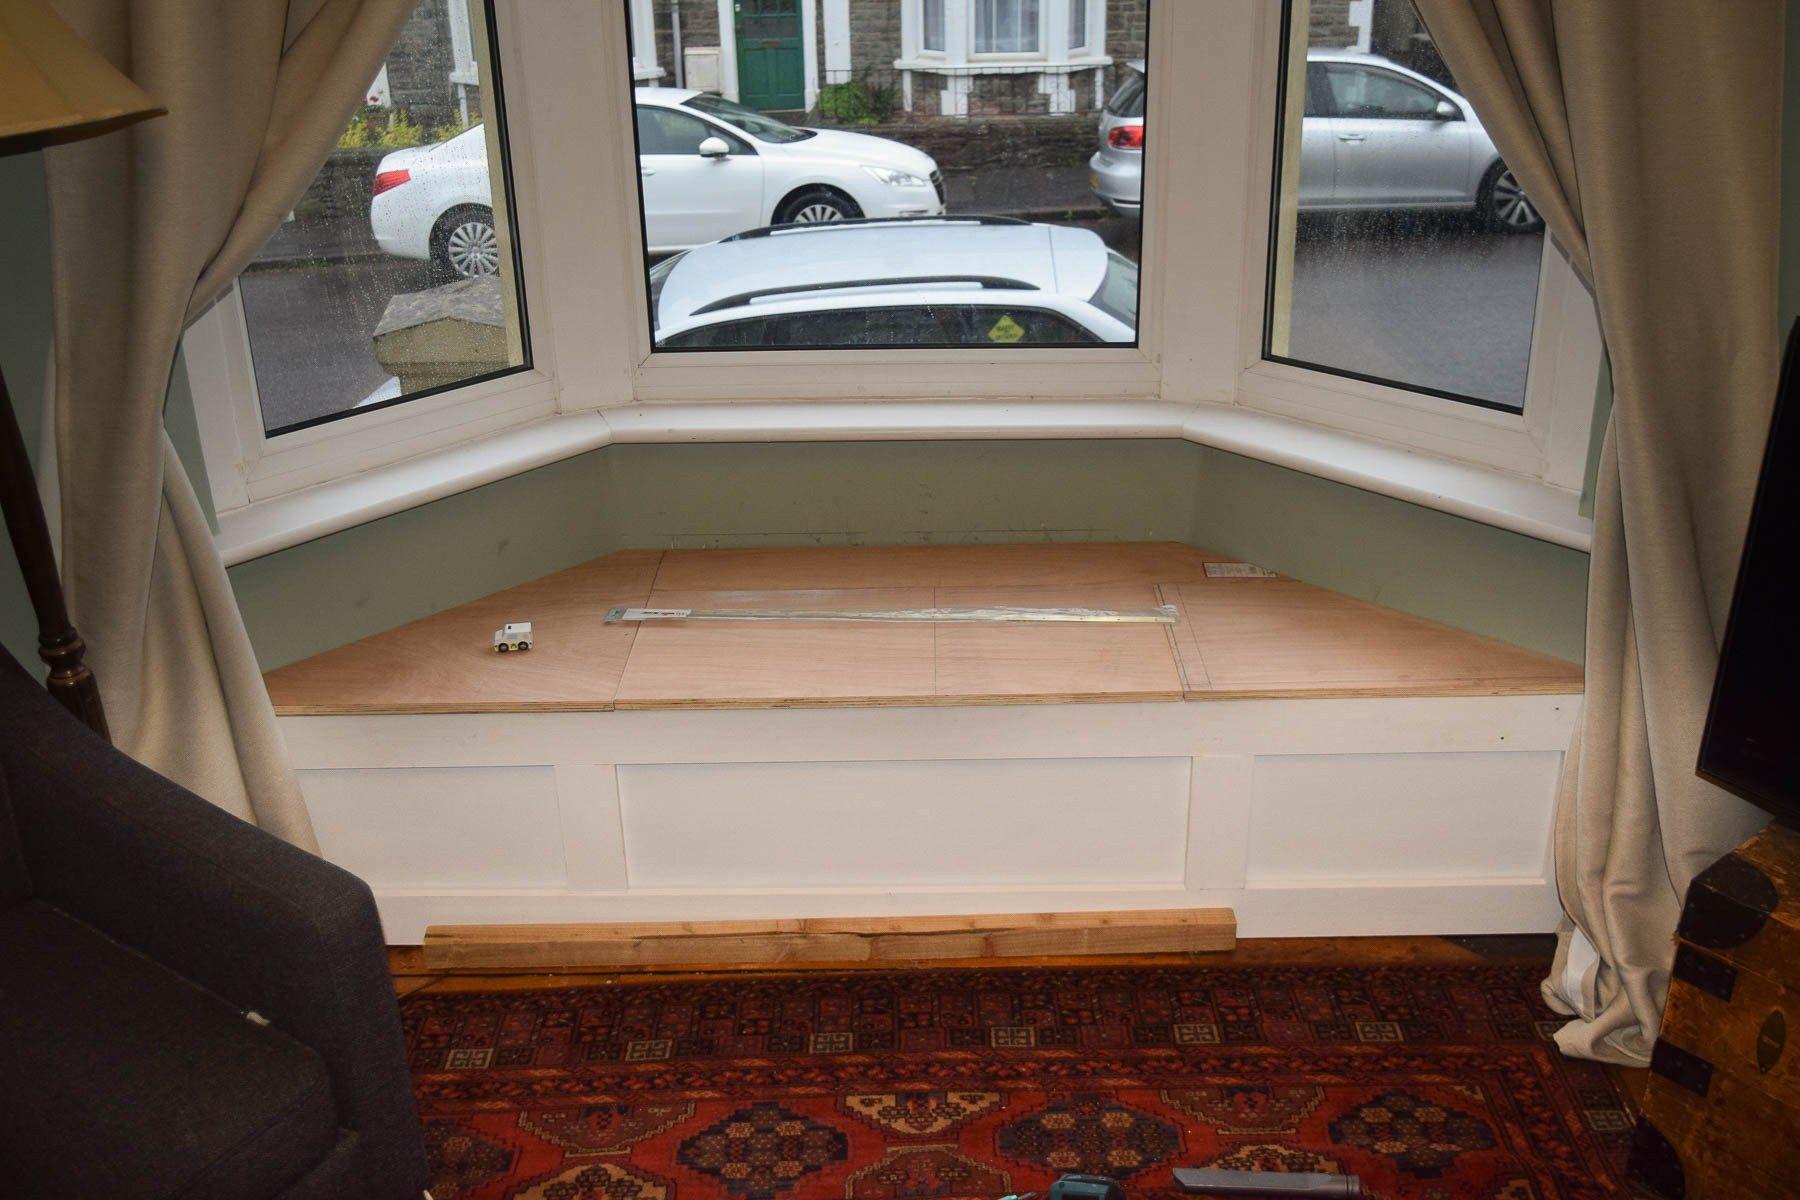 Superb How To Build A Victorian Bay Window Seat With Storage Creativecarmelina Interior Chair Design Creativecarmelinacom